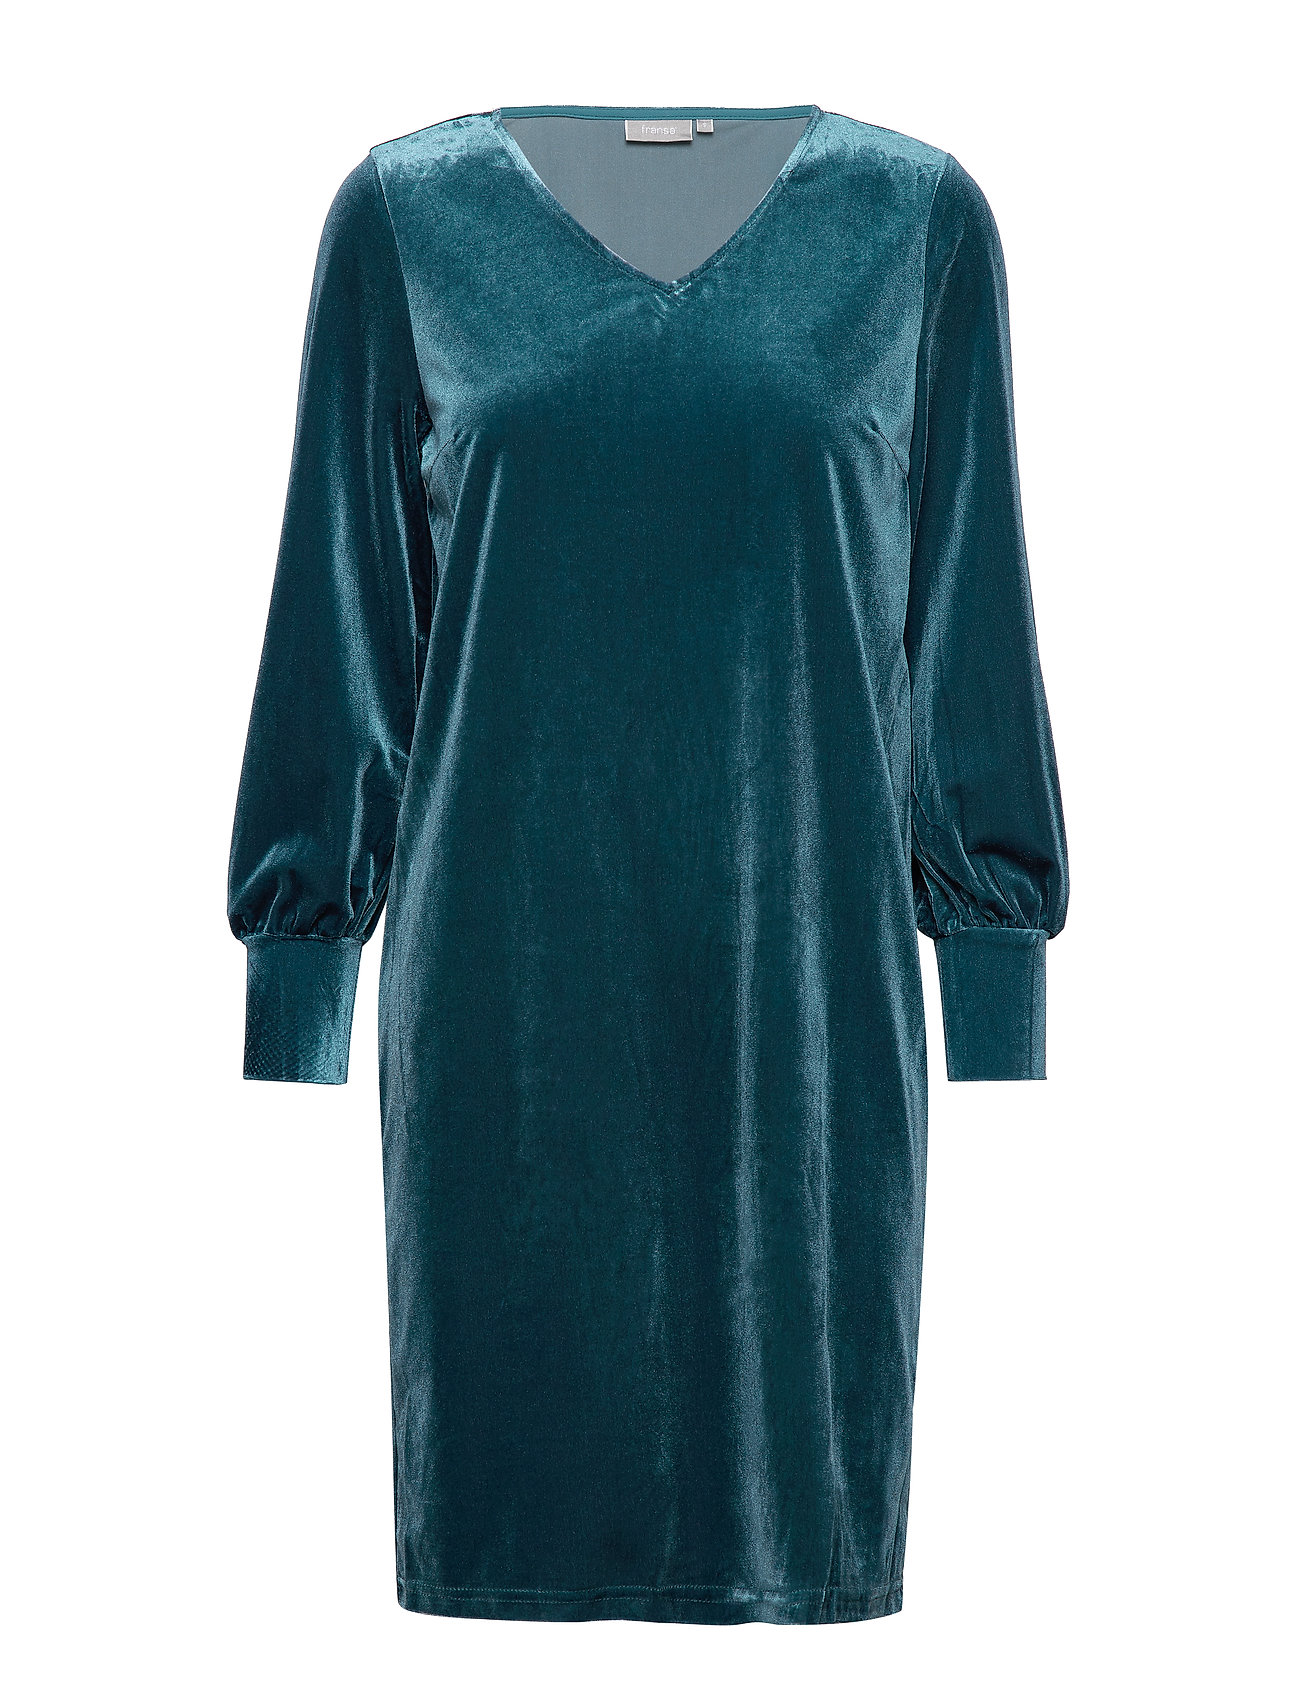 Fransa FRGIVELVET 1 Dress - REFLECTING POND